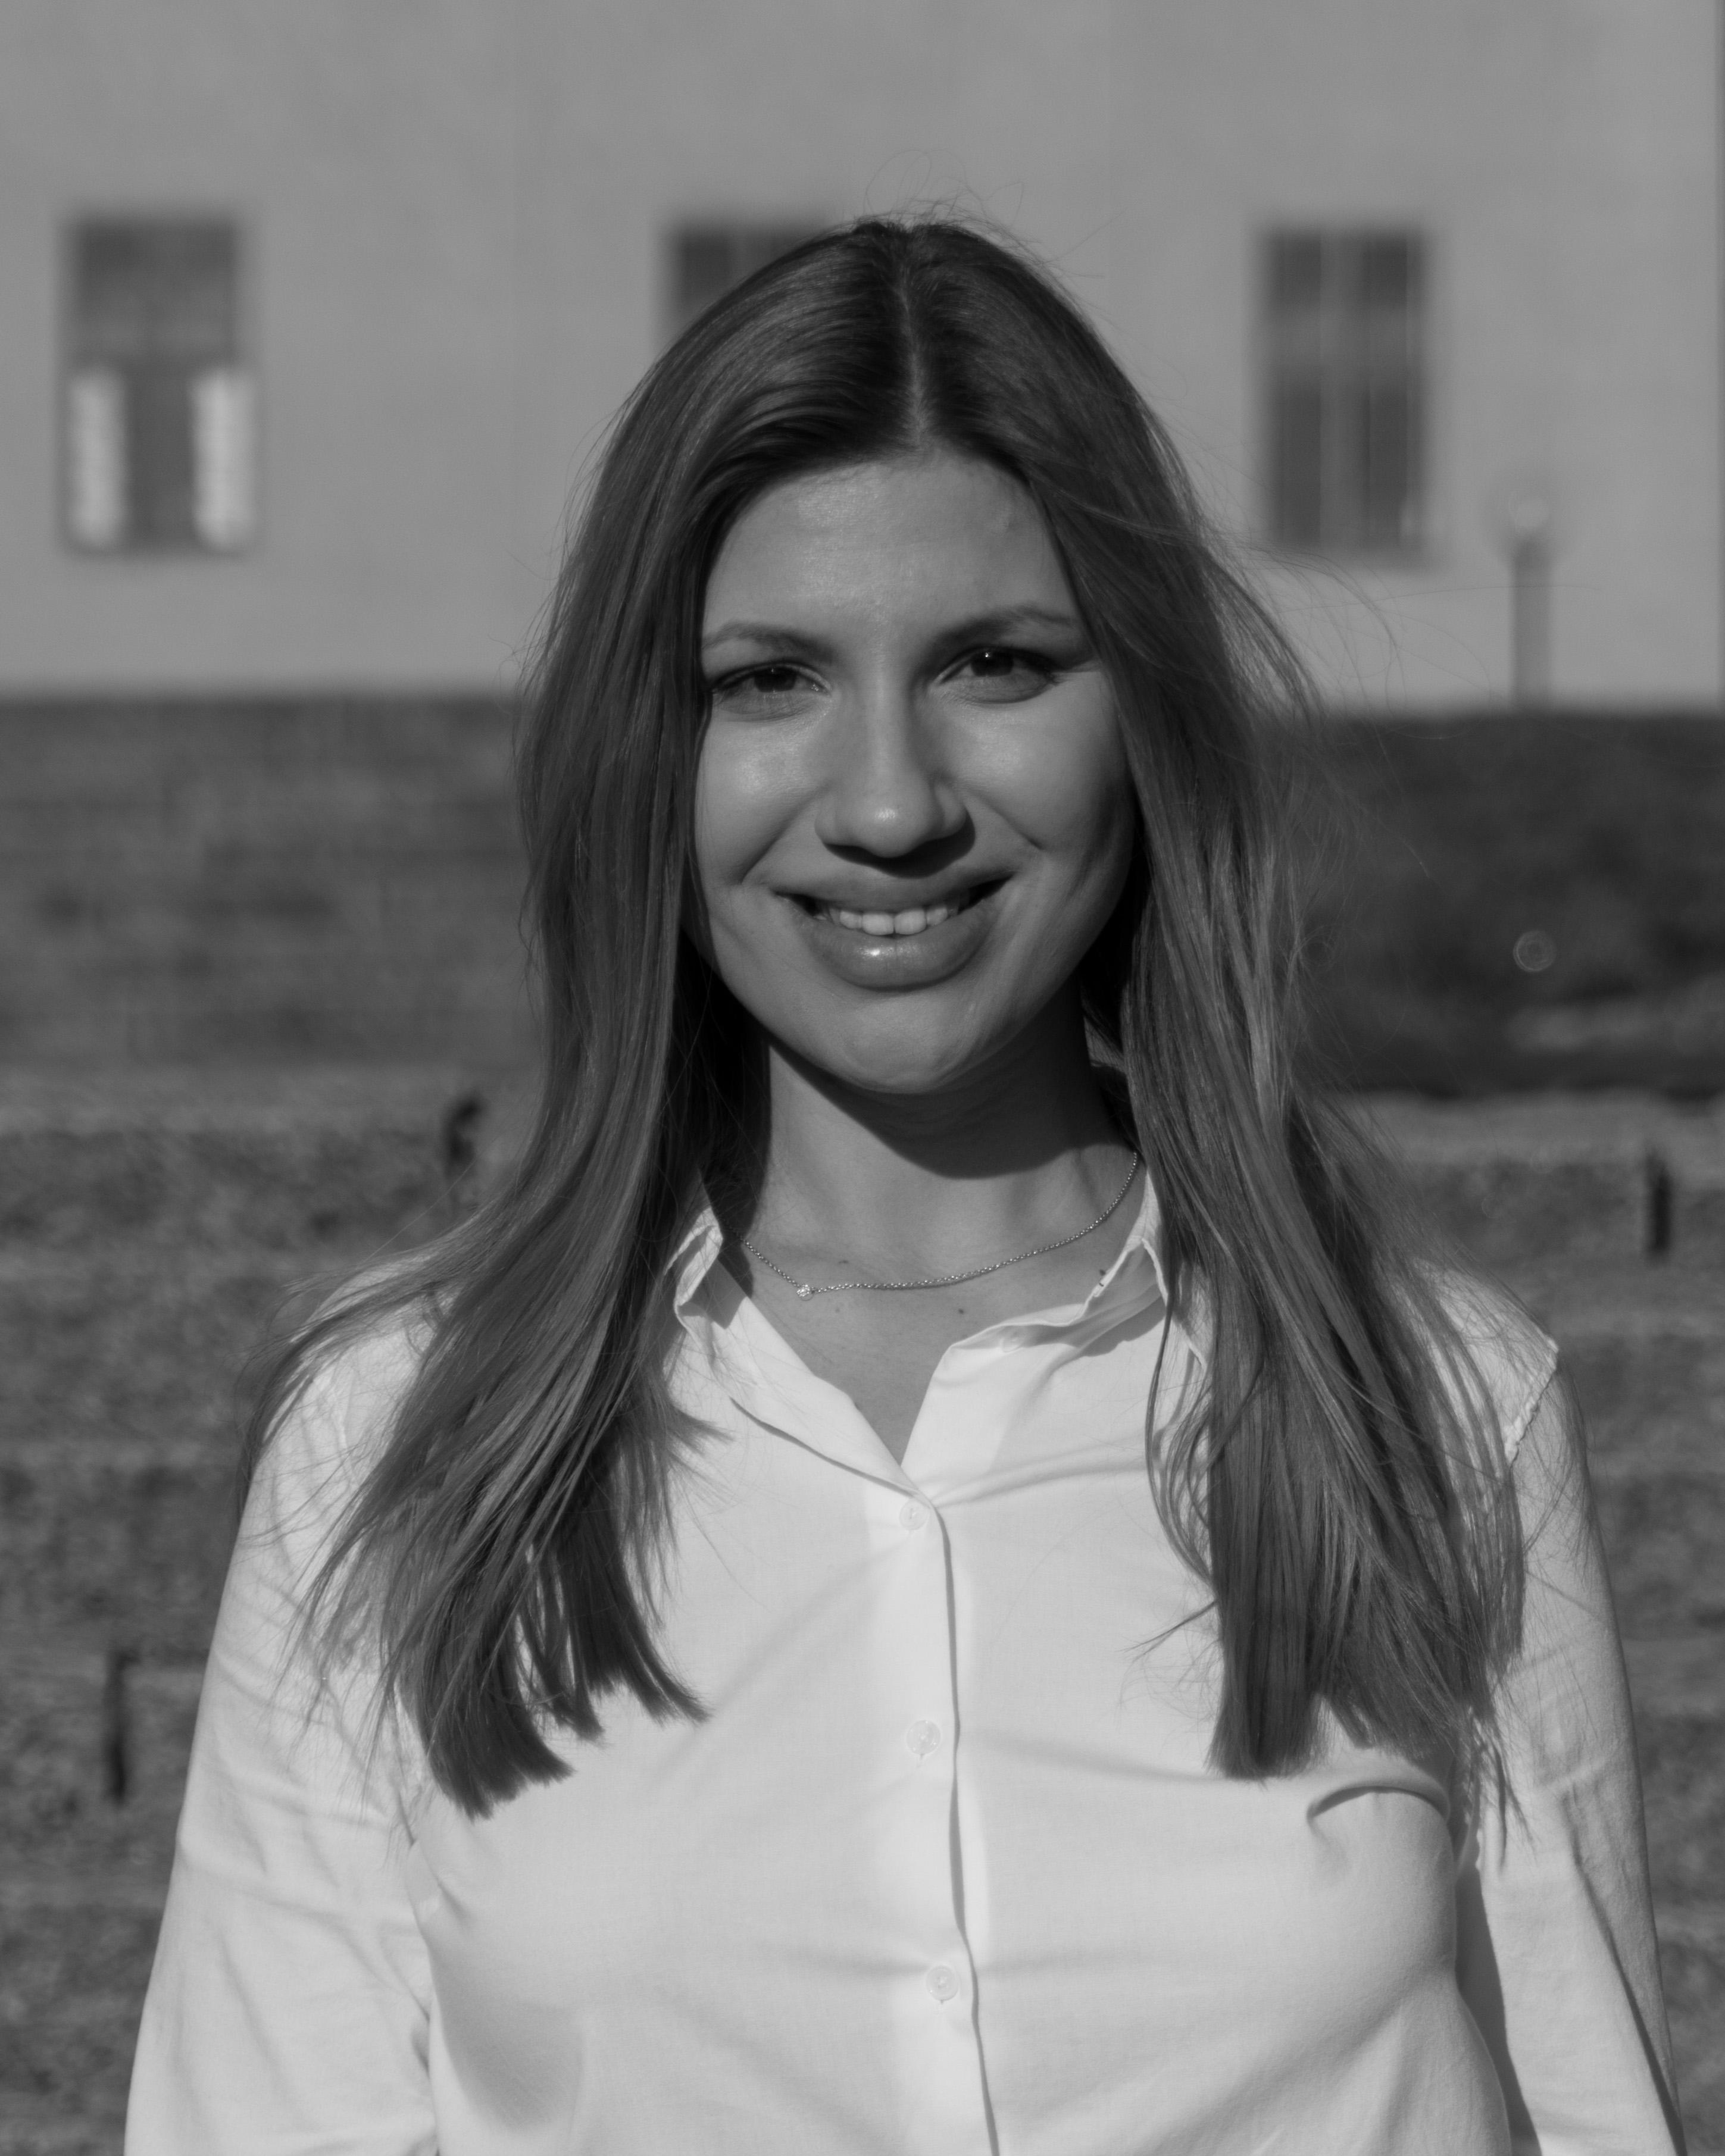 Hanna Bergström Raouf